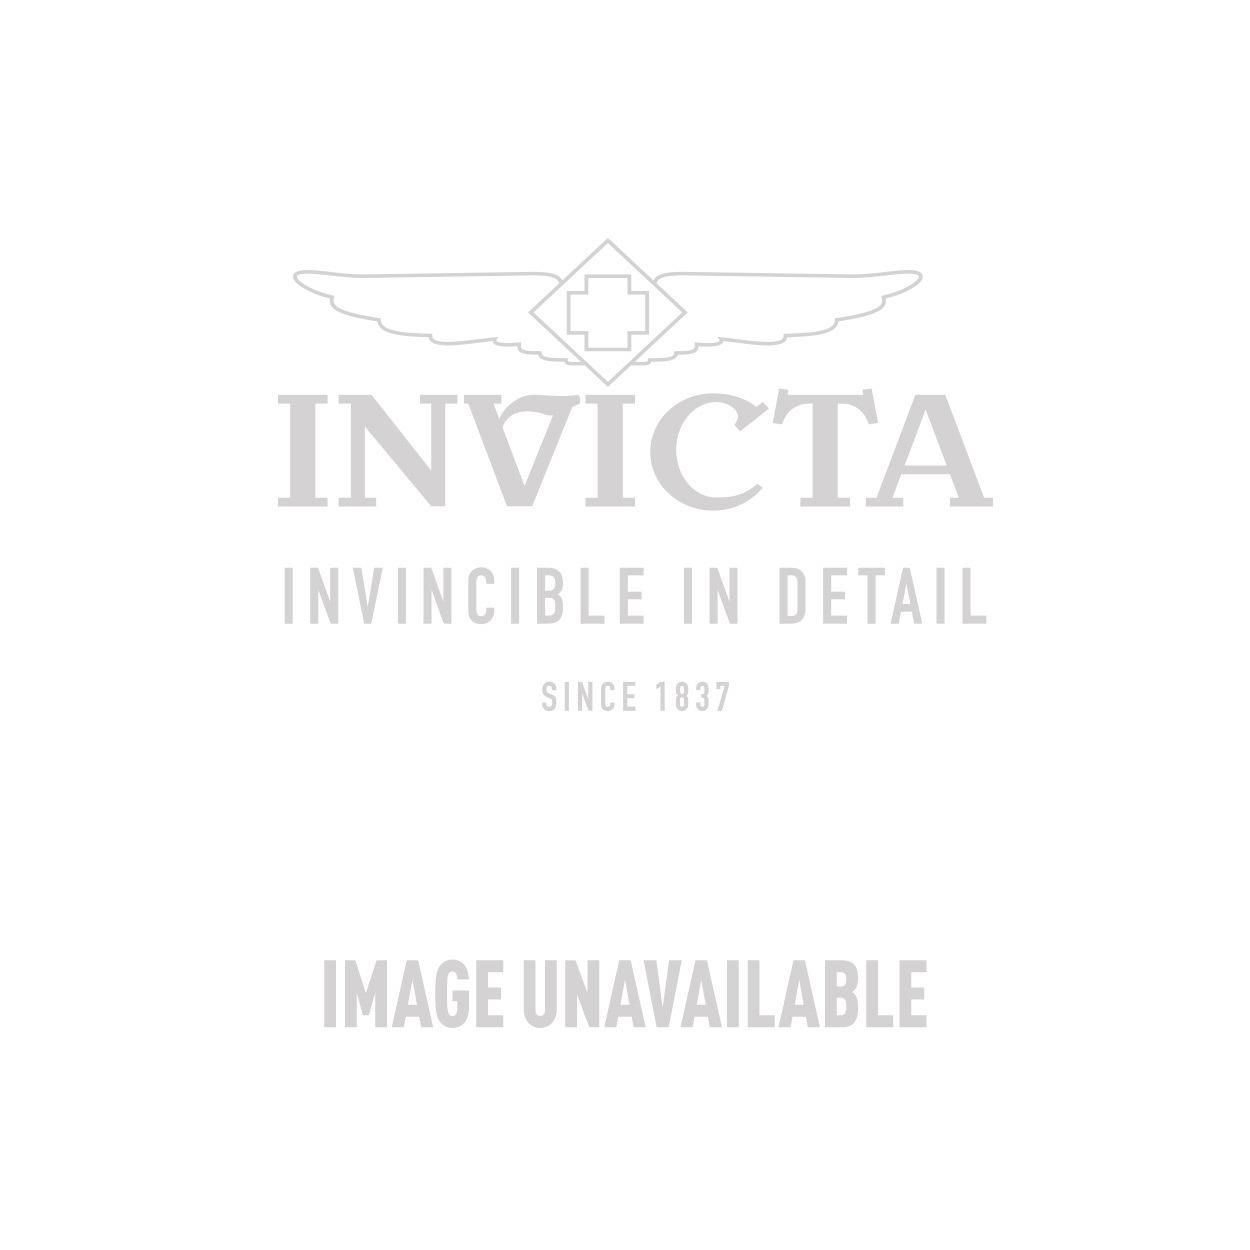 Invicta Sea Base Men Watches In Gold Model 17983